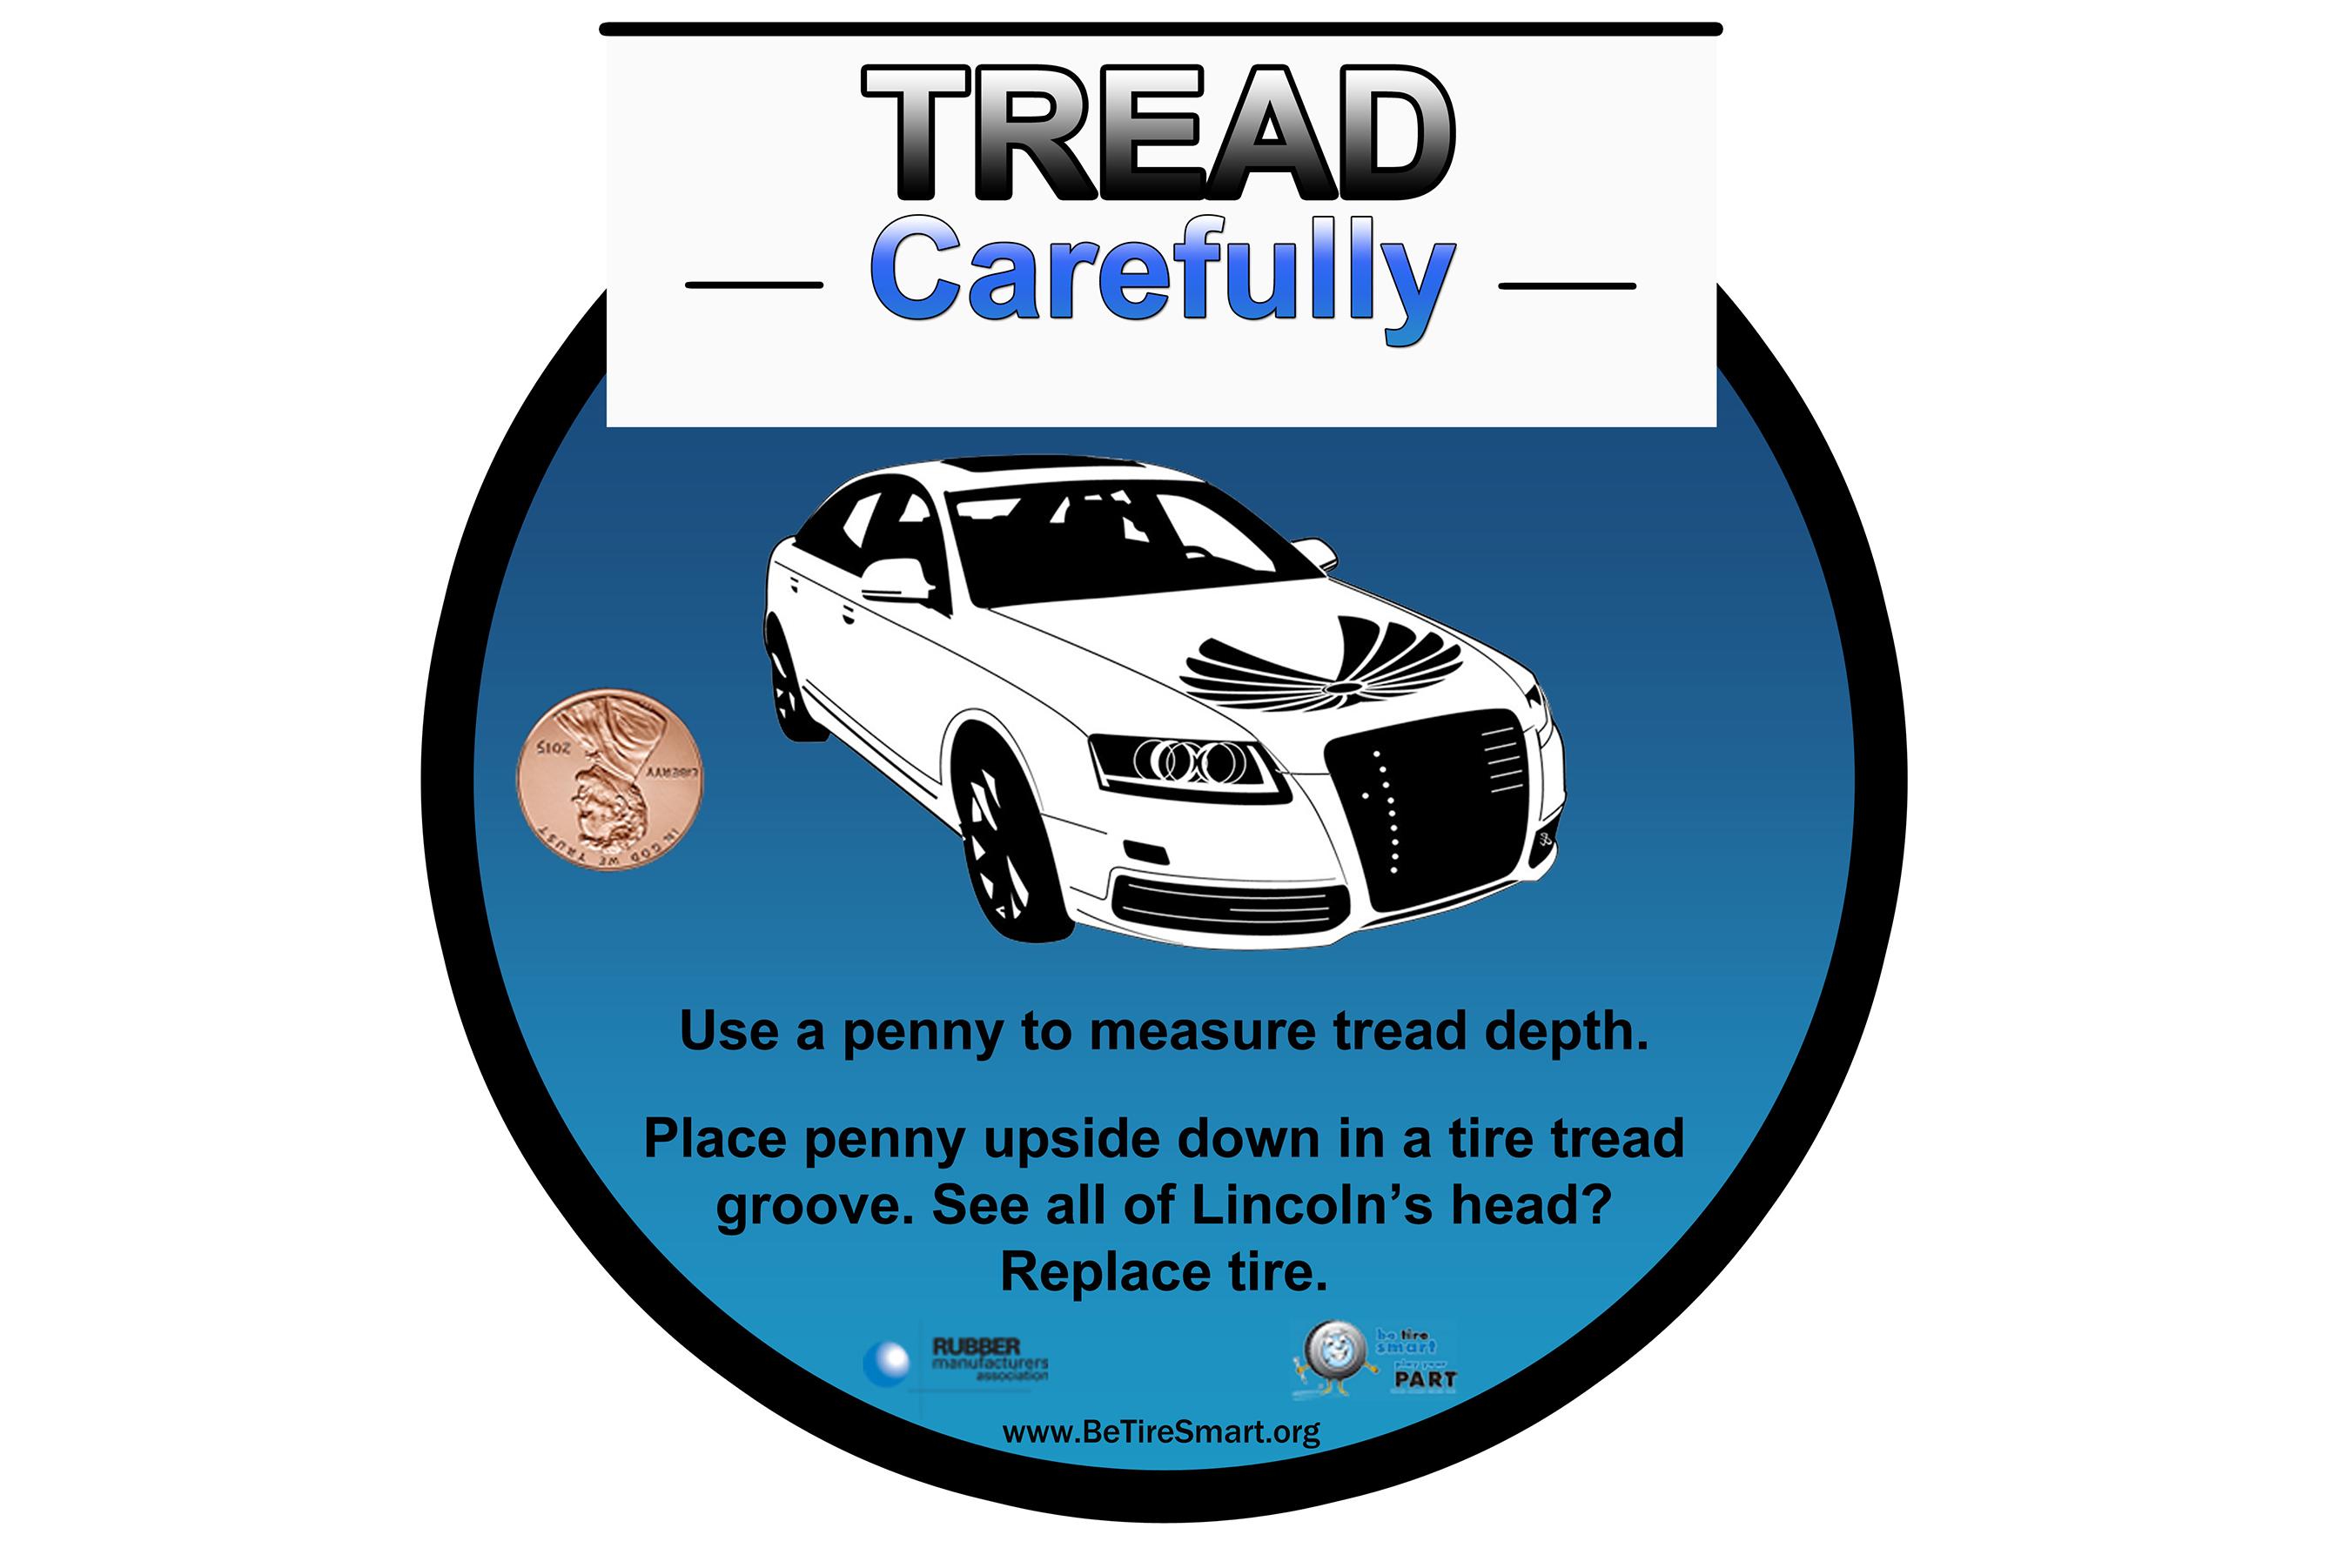 Use a penny to measure tread depth.